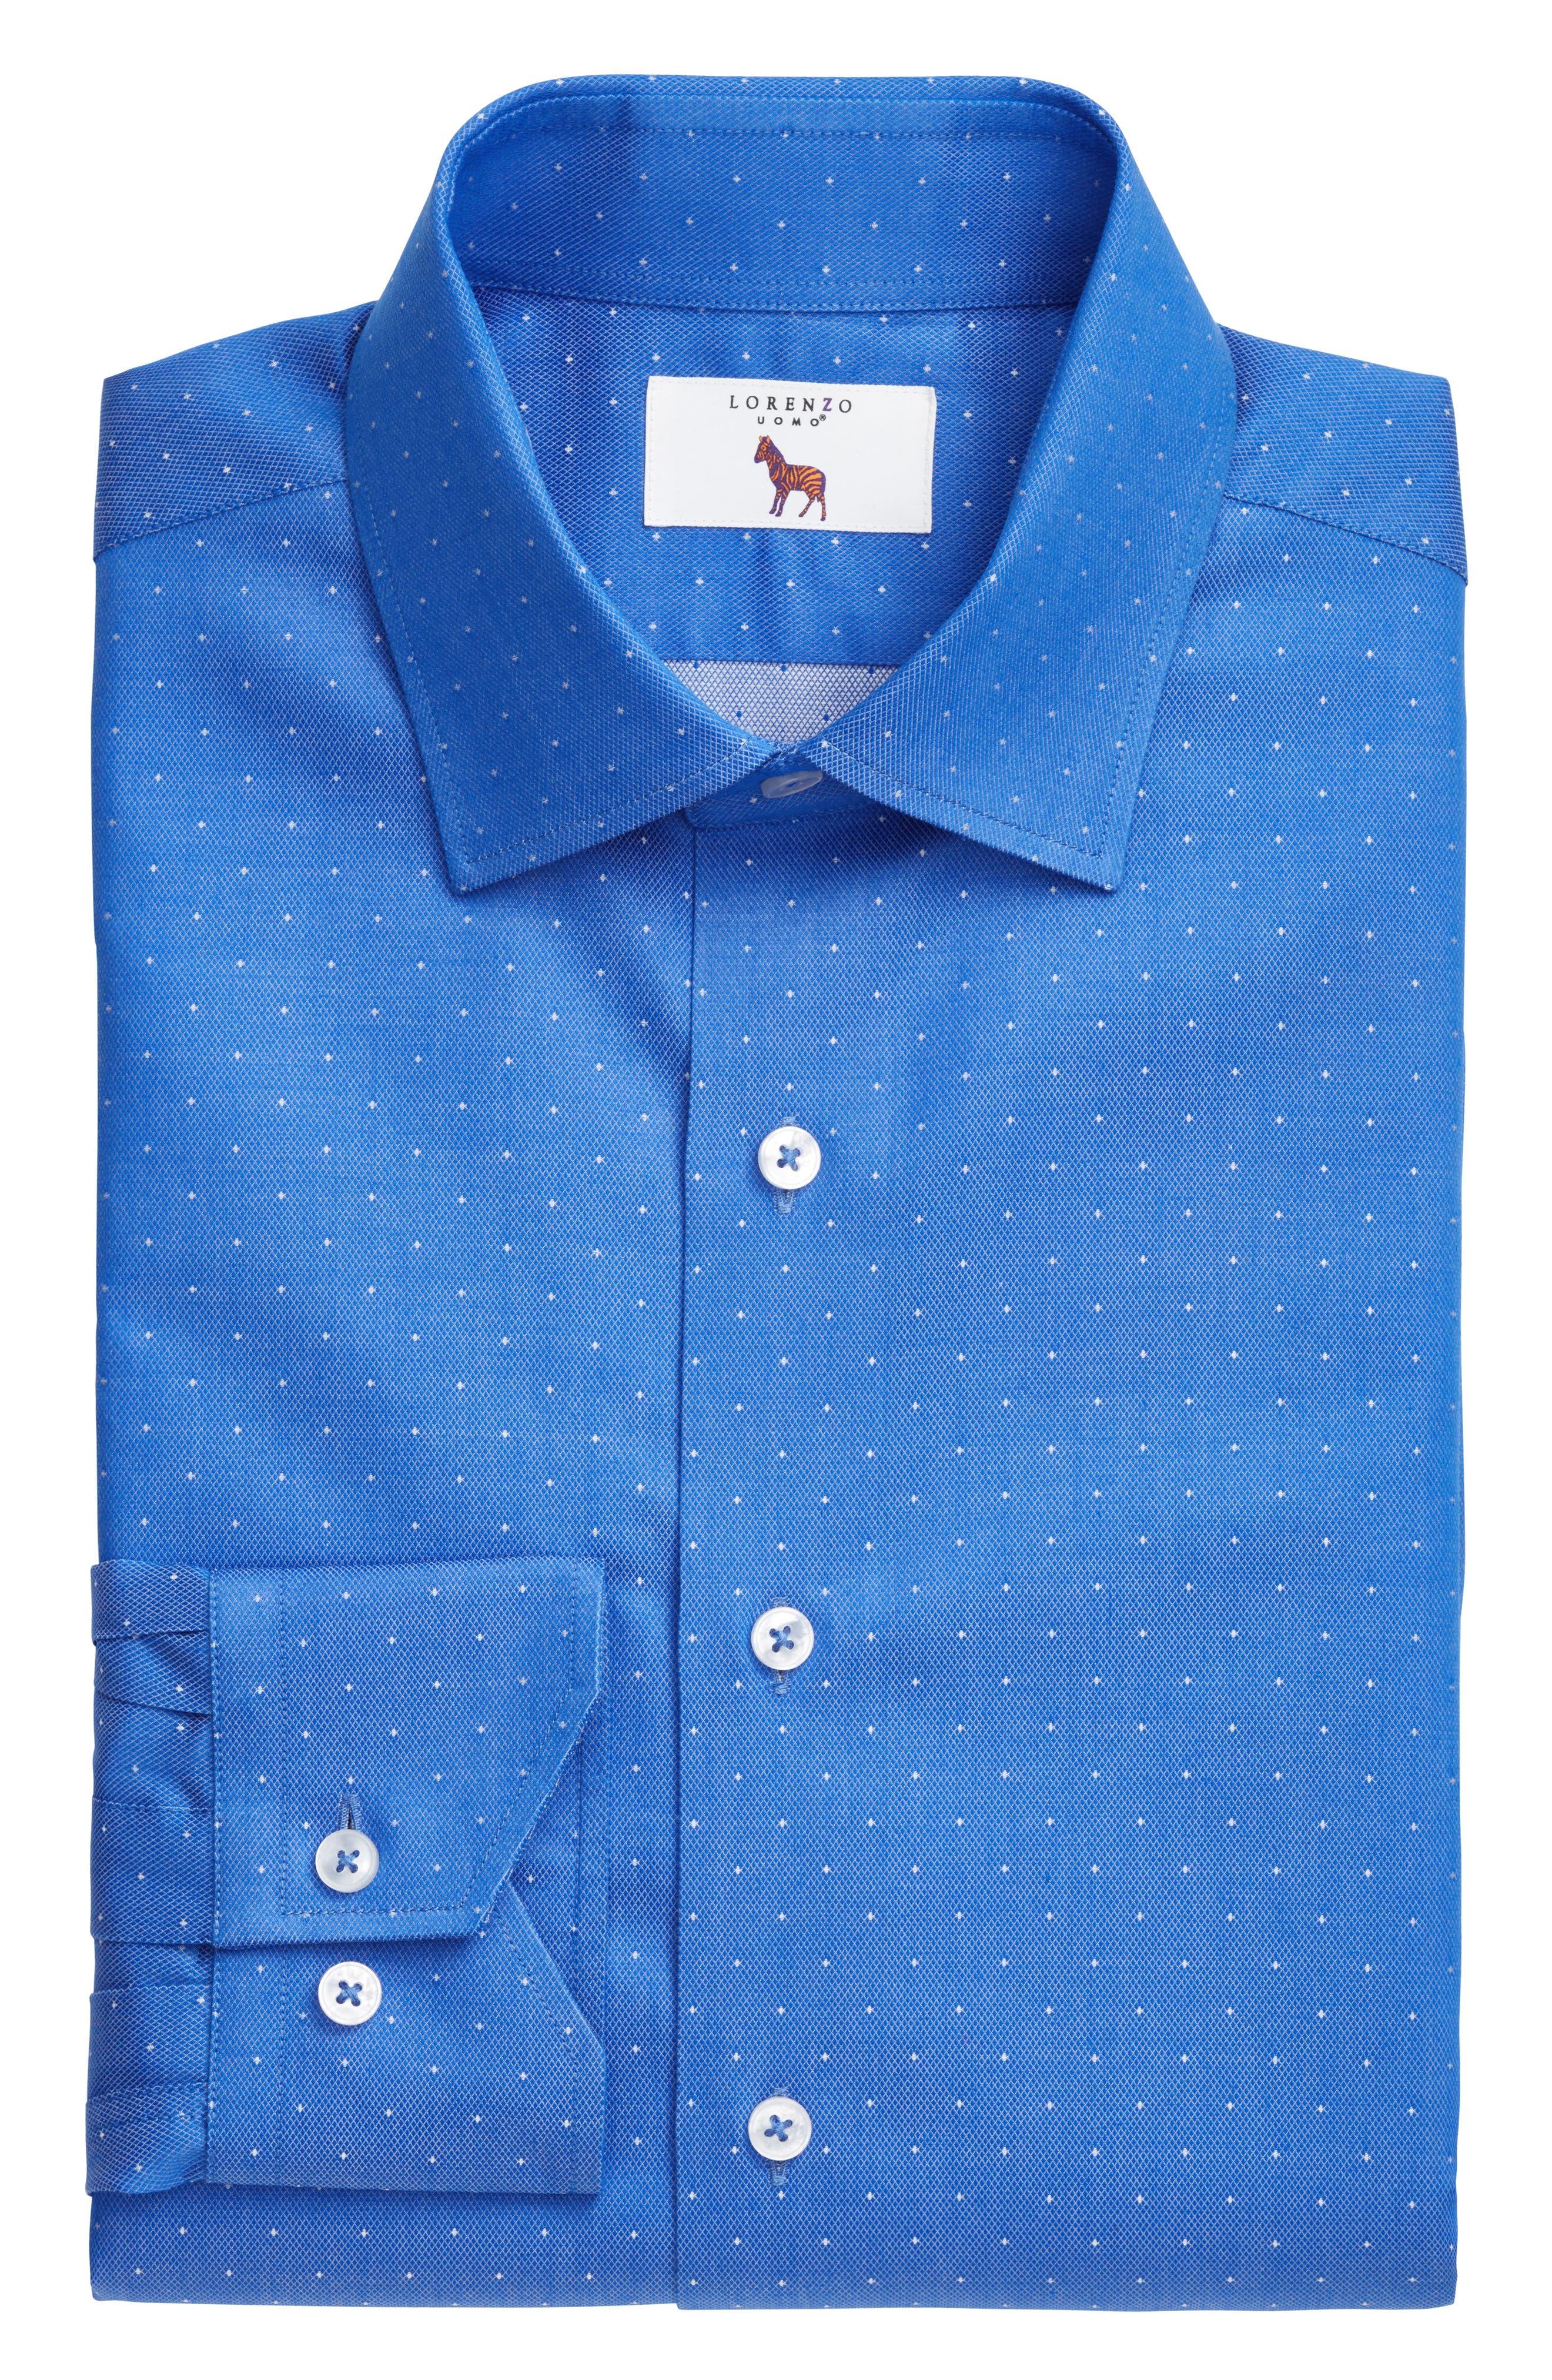 LORENZO UOMO, Trim Fit Dot Dress Shirt, Alternate thumbnail 3, color, ROYAL